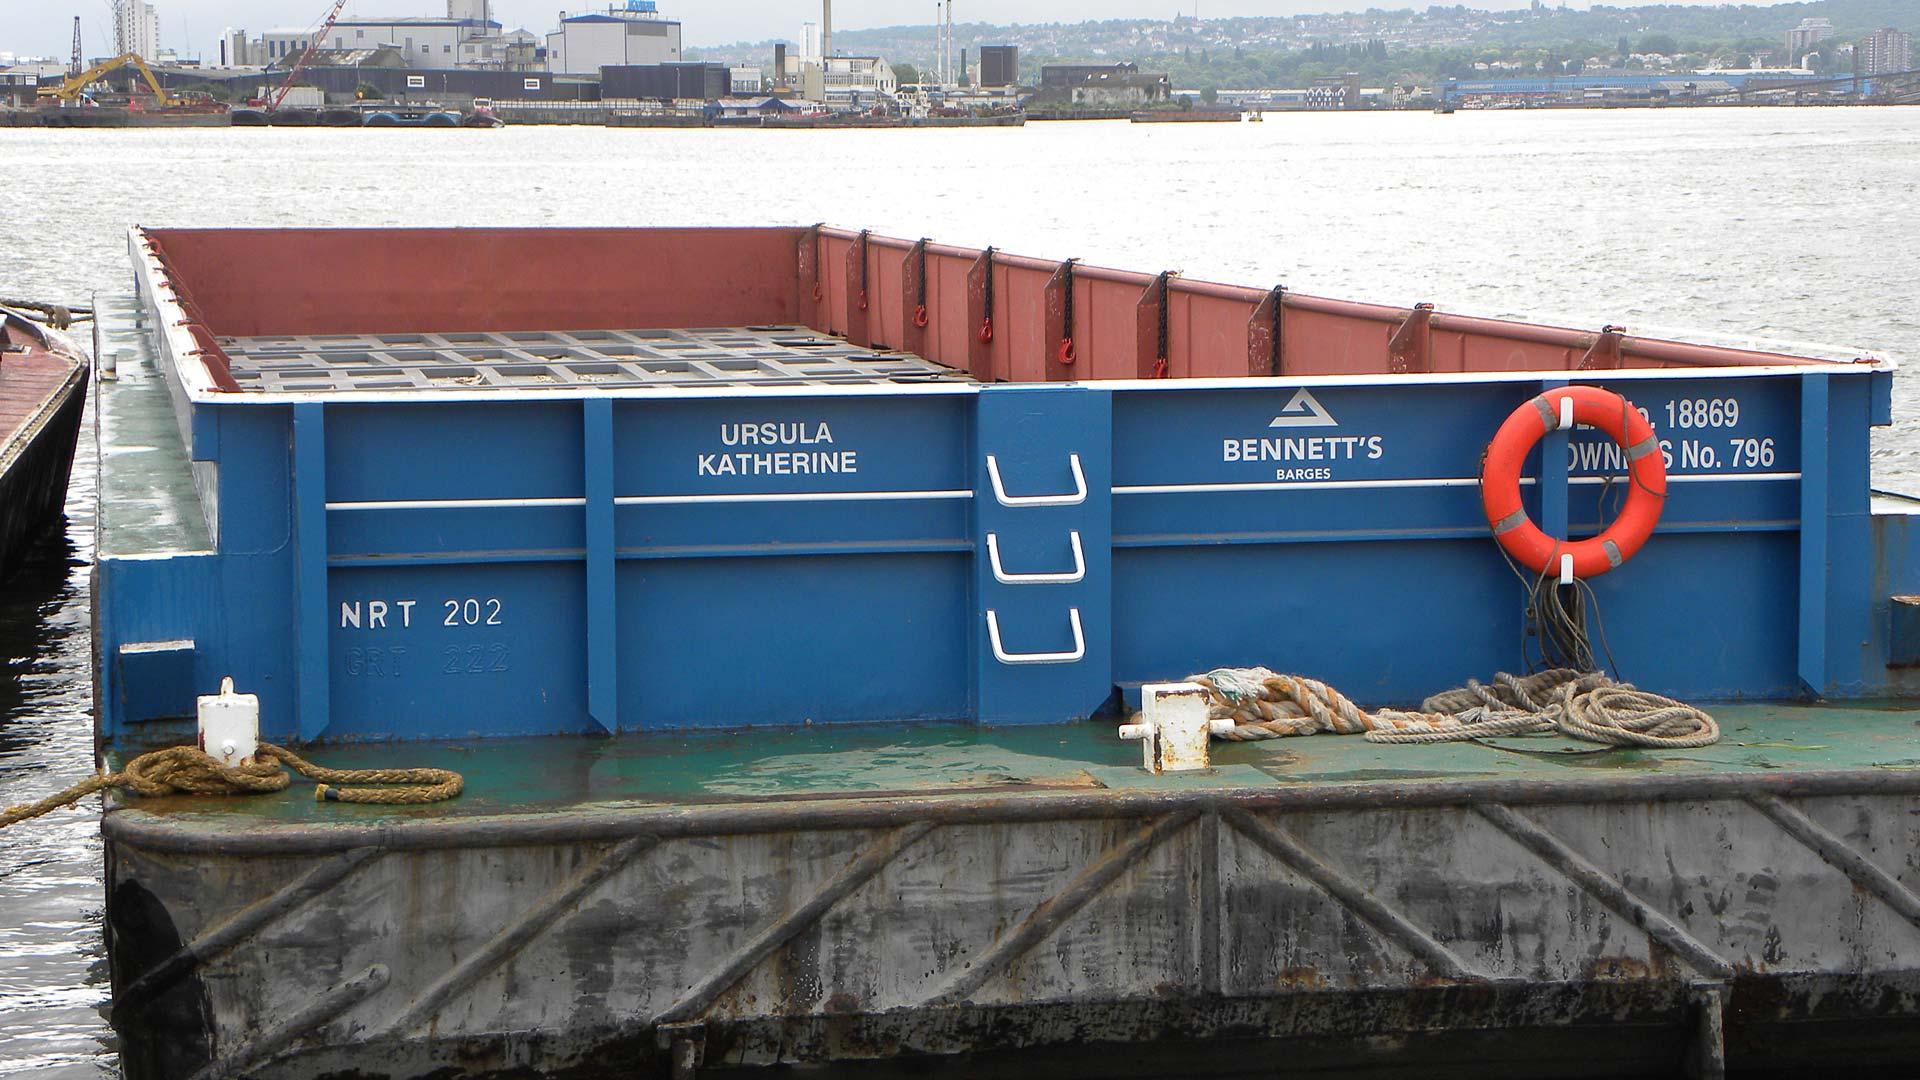 ursula katherine barge